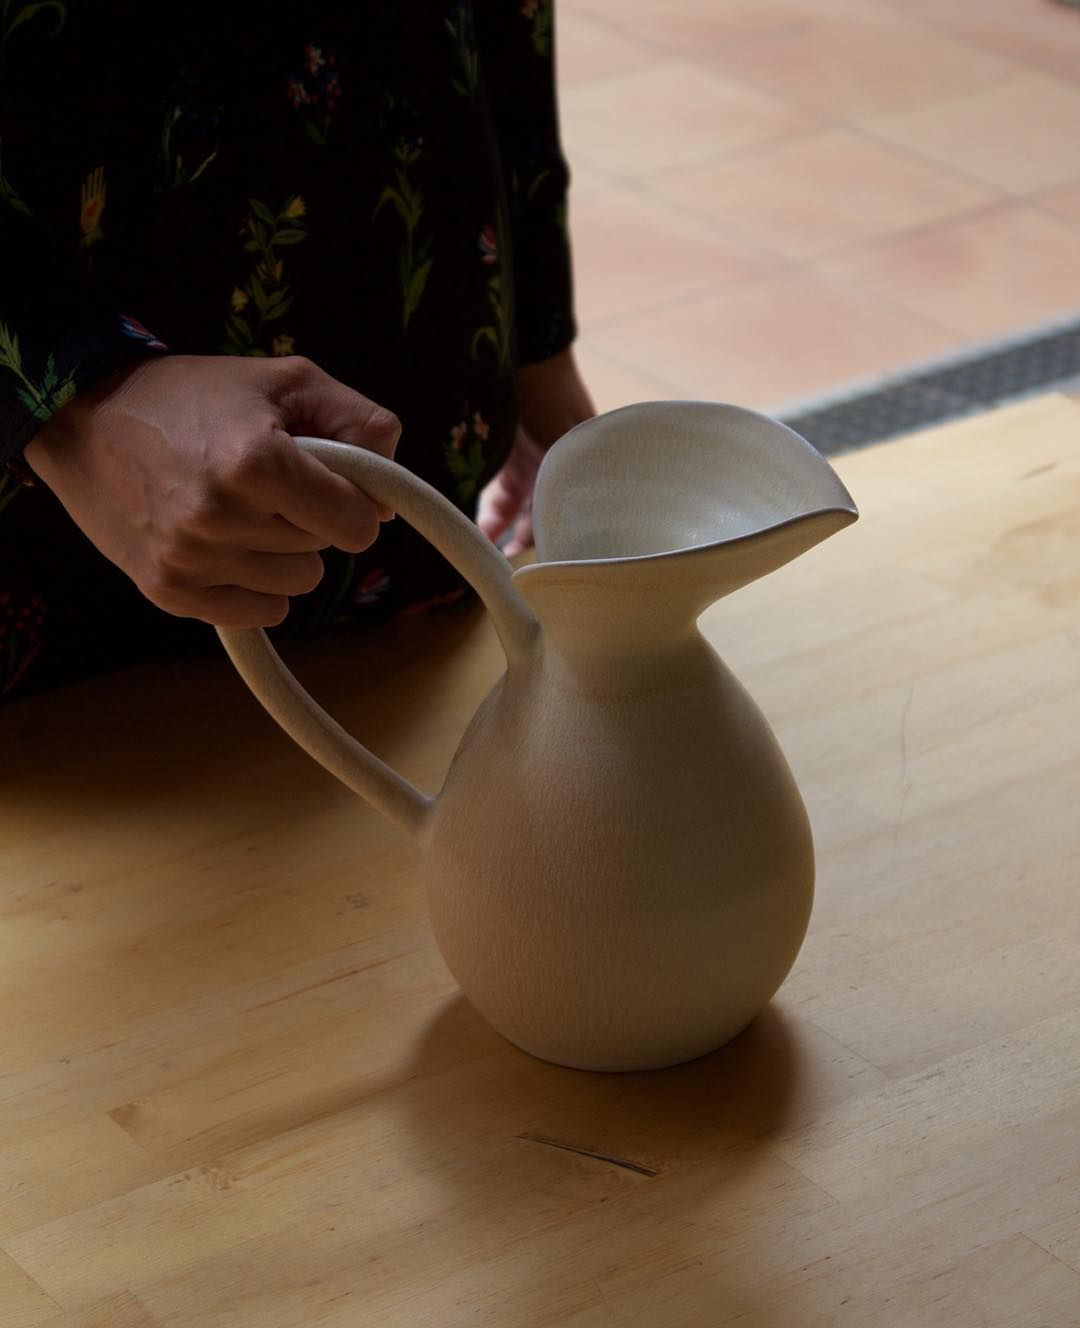 Flashback To A Very Special Limited Ceramic Collection Ceramics Loveceramic Stoneware Vase Tableware Homeinterior Design Vajilla Vajillas